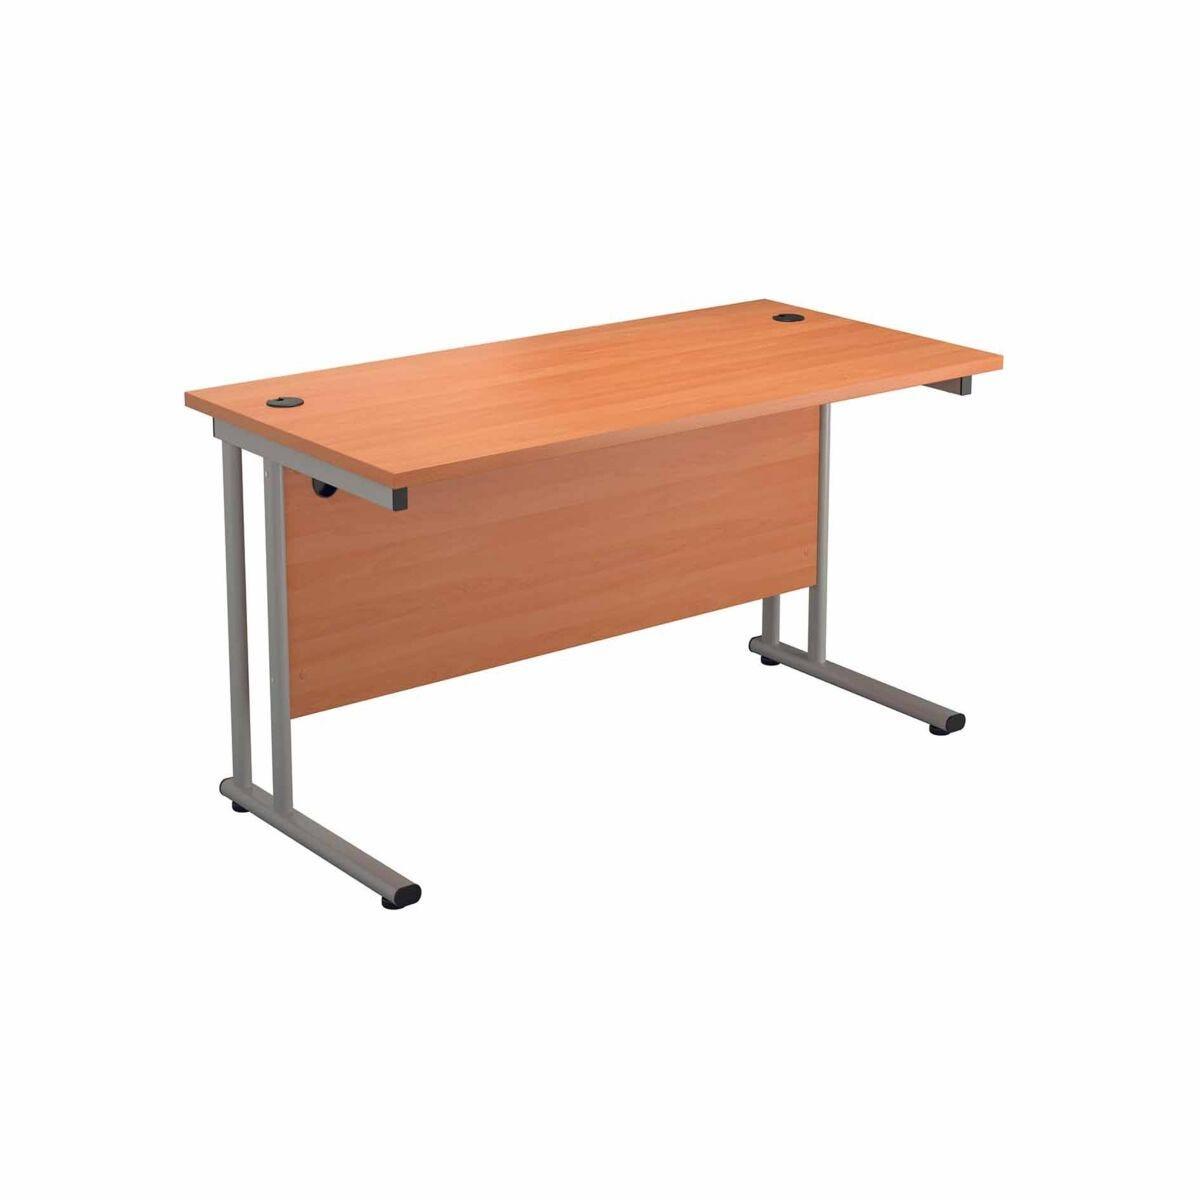 TC Office Start Silver Cantilever Frame Desk 1200x800mm